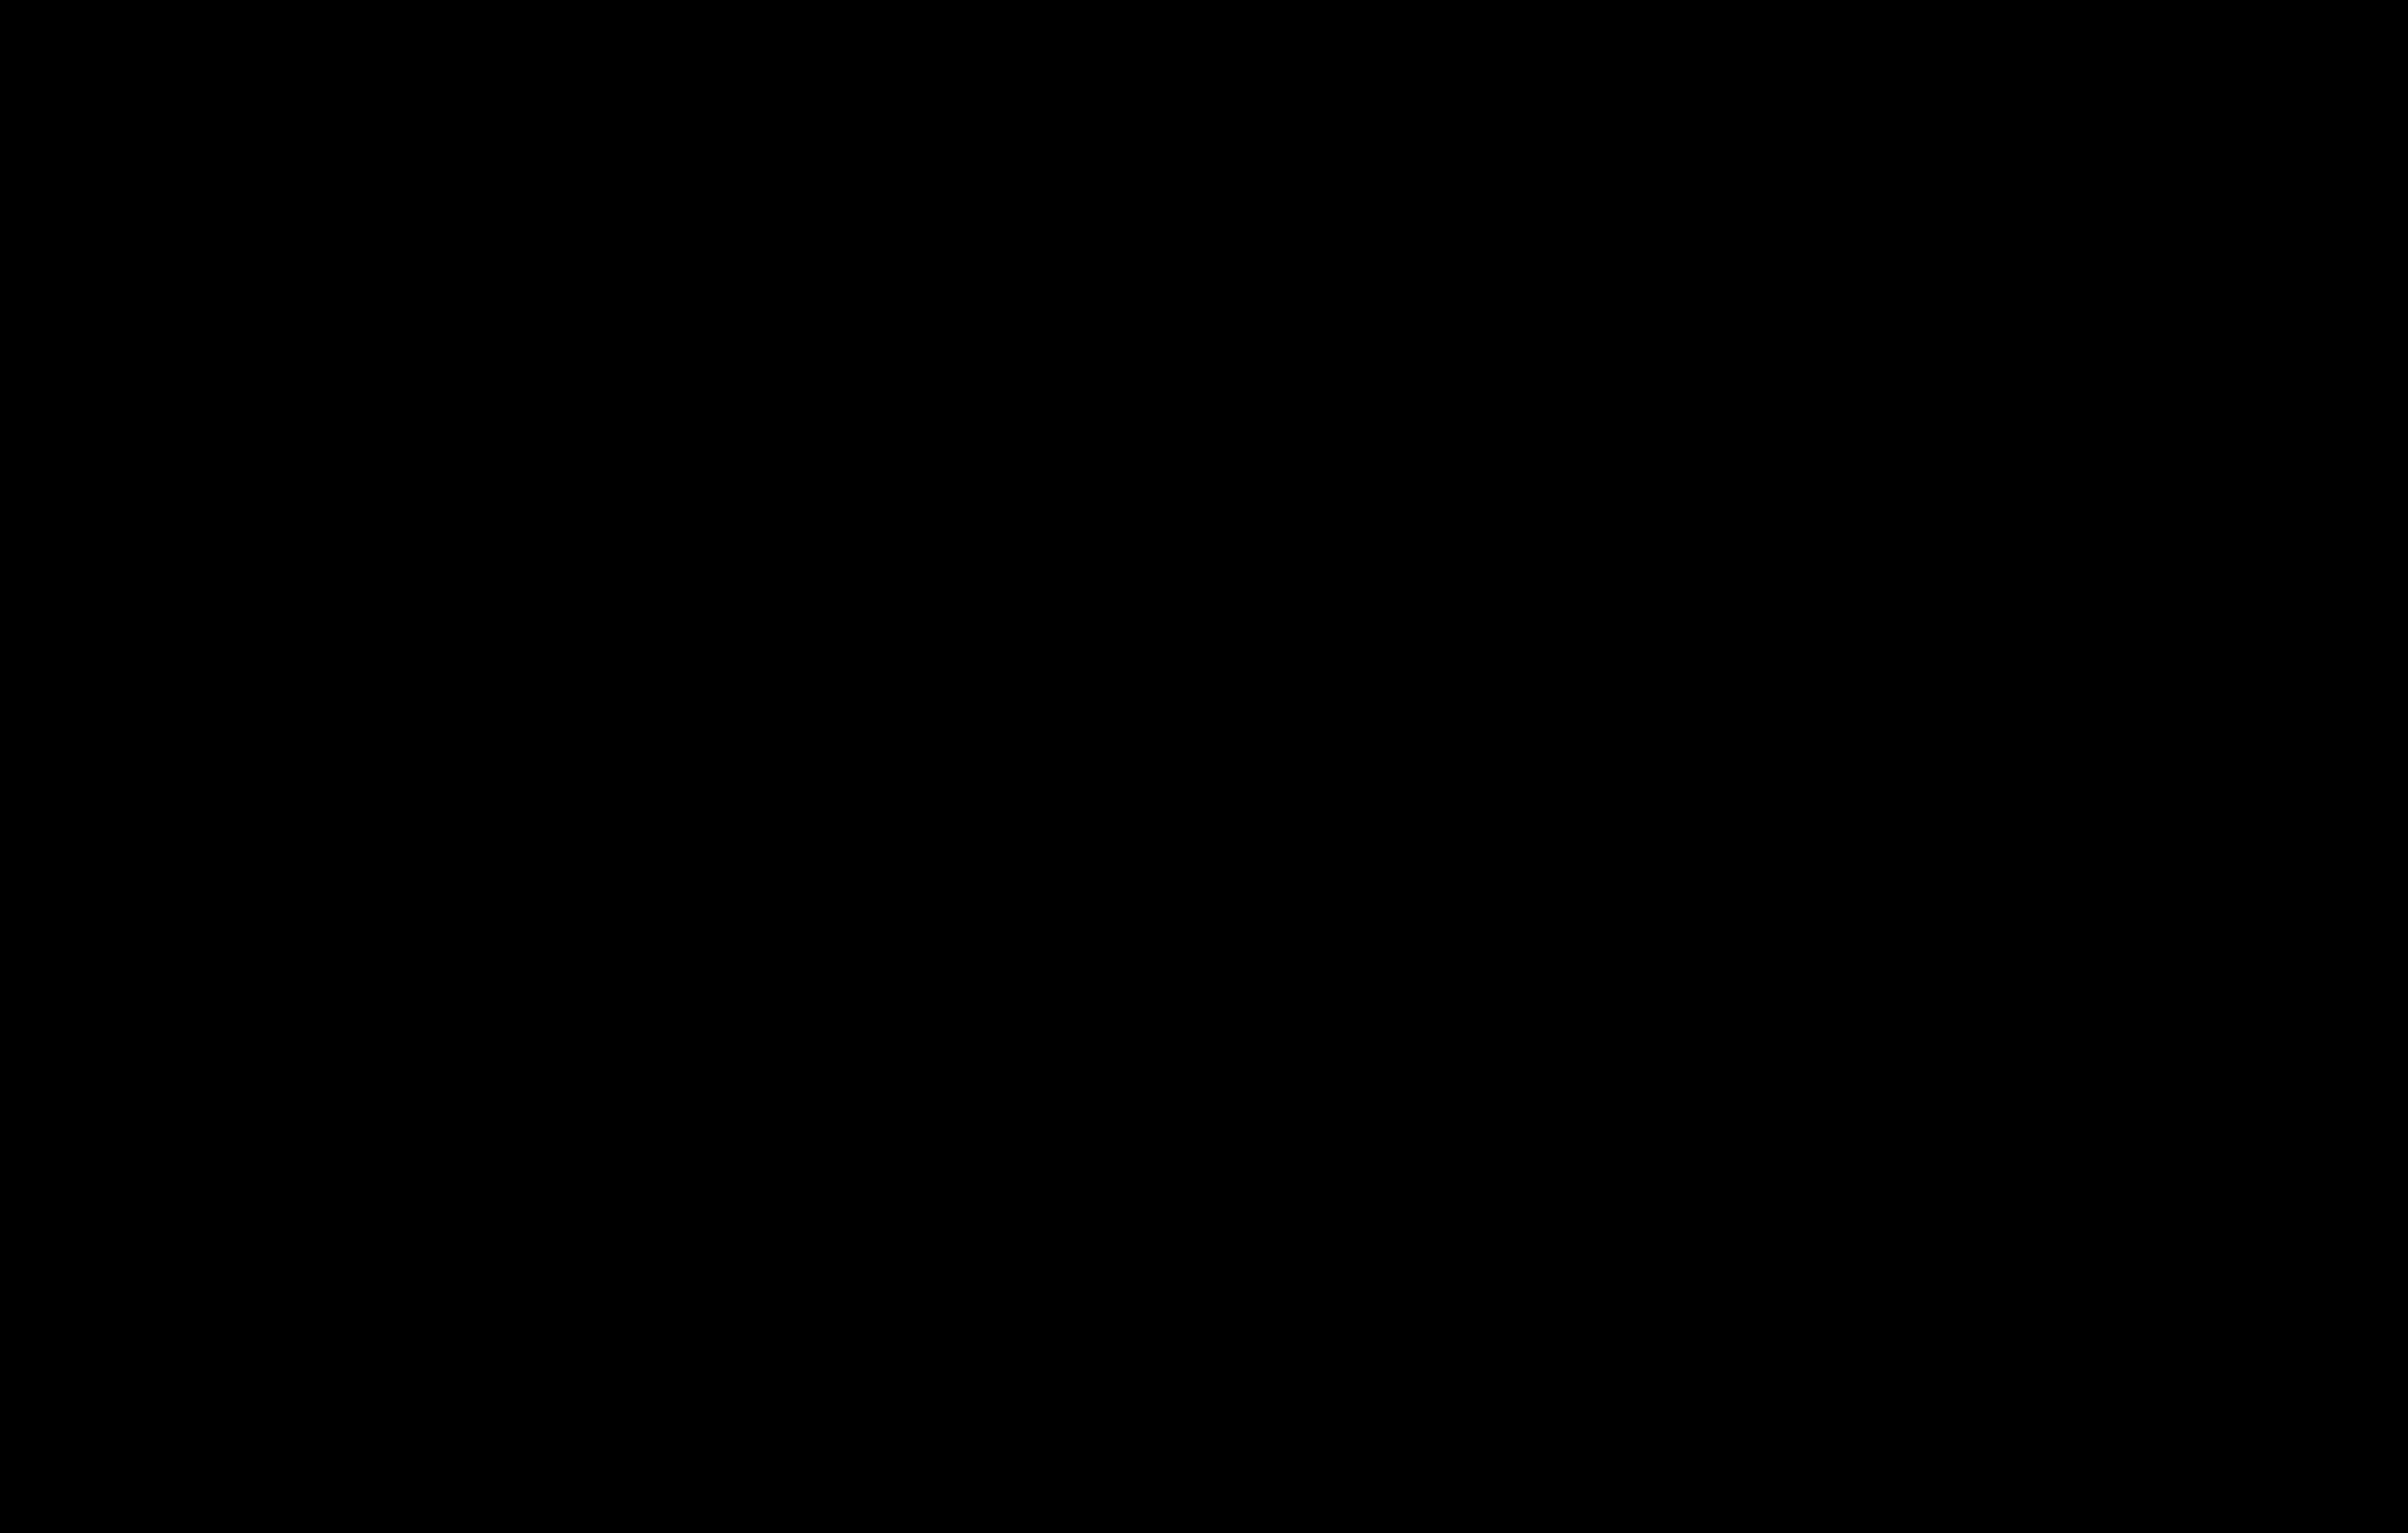 Dansylspermidine-d<sub>8</sub>